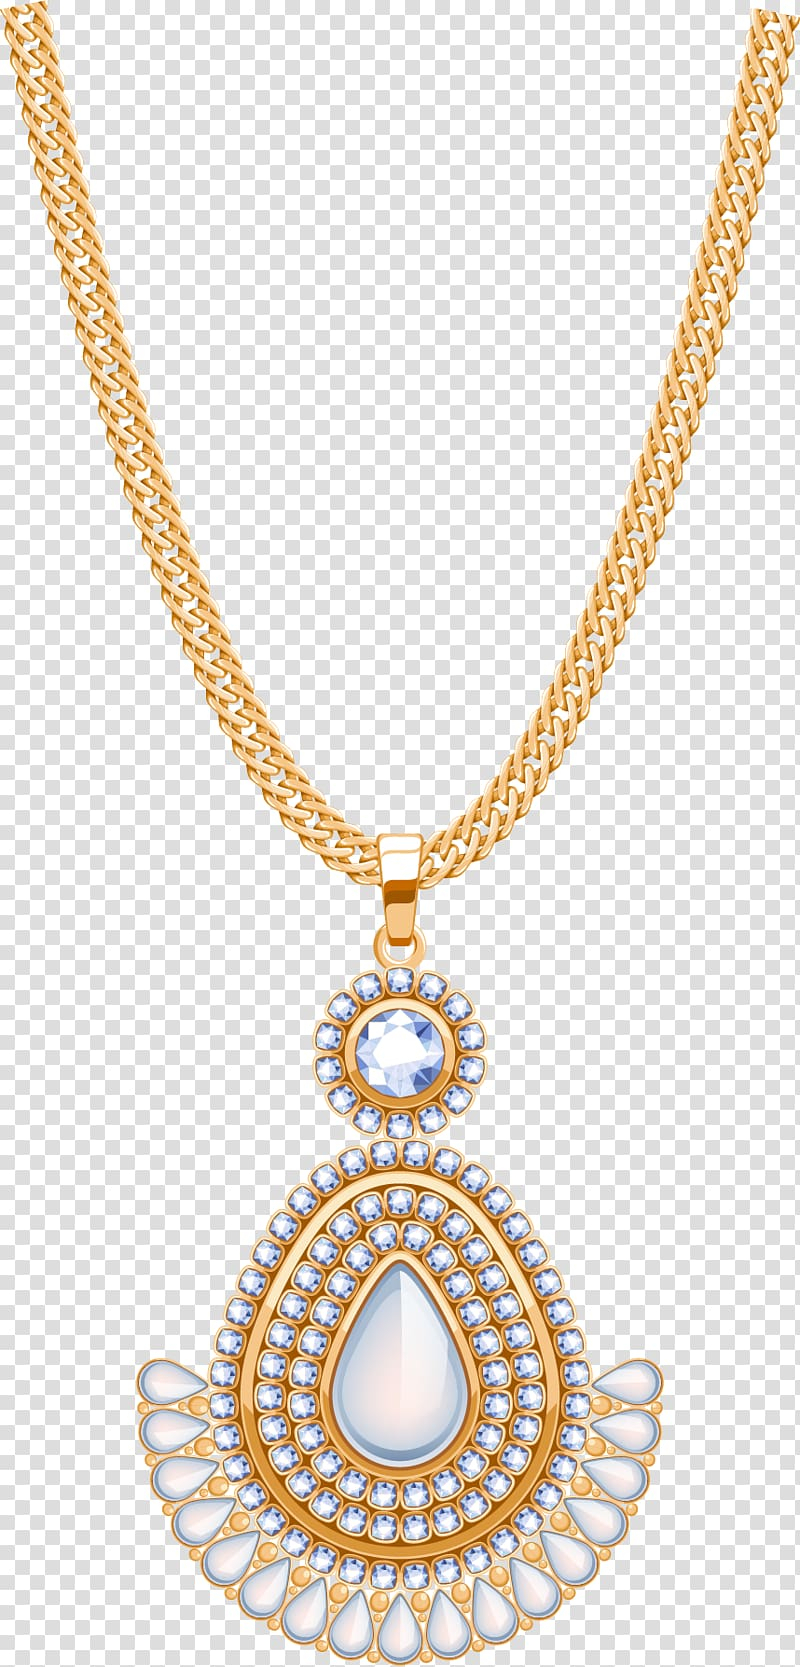 Locket Necklace Gemstone Diamond Jewellery, Dazzling Jewelry Diamond Pertaining To Latest Dazzling Locket Pendant Necklaces (View 11 of 25)